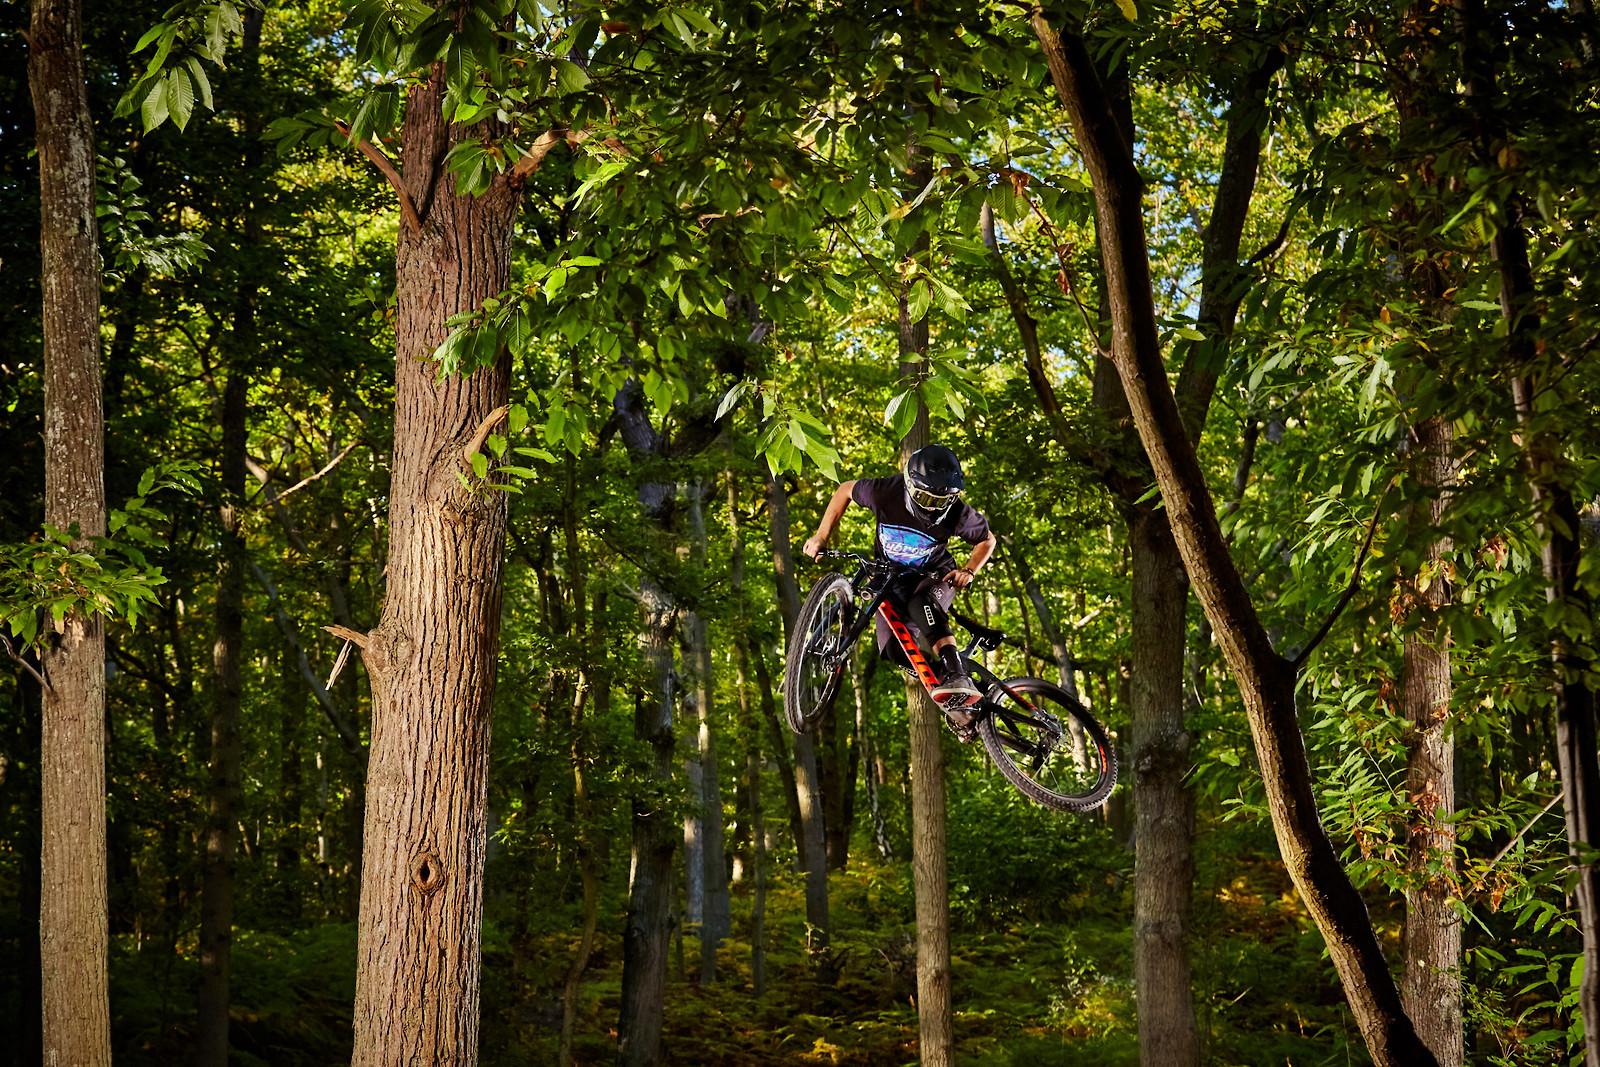 Sideway - Romuald_Manach - Mountain Biking Pictures - Vital MTB